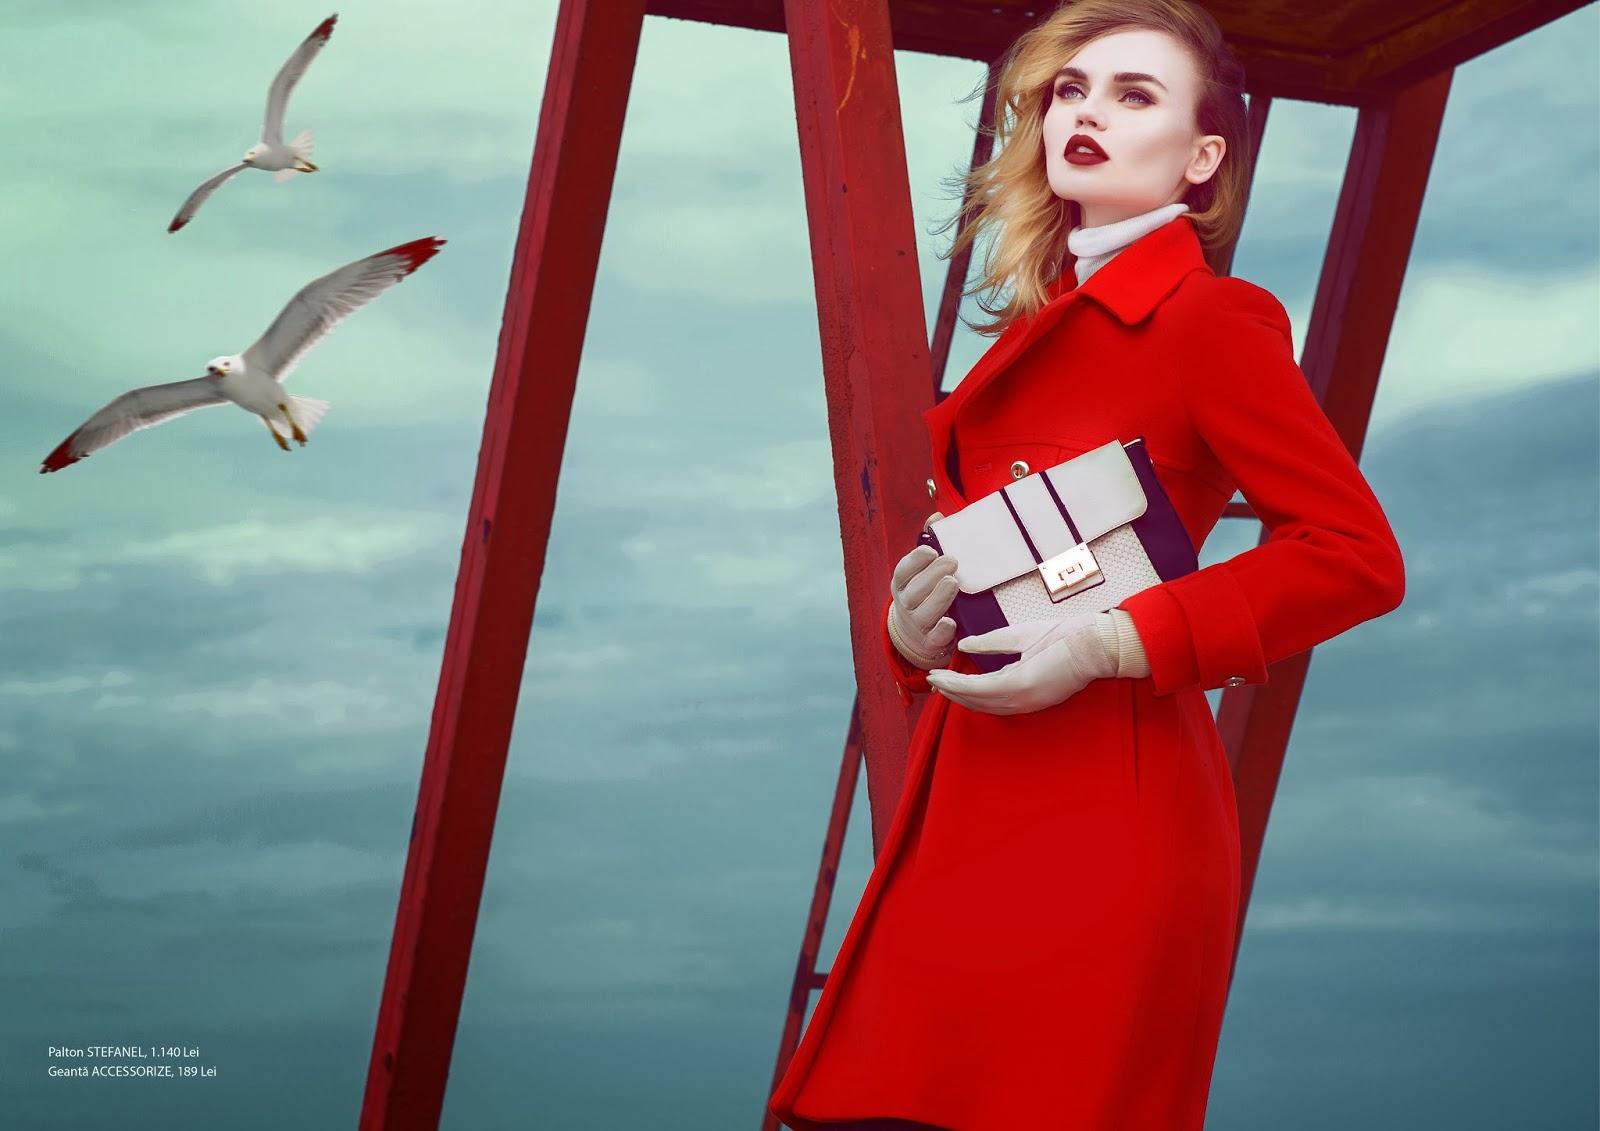 Magazine Photoshoot : Elena Matei Photoshot For Stefan Dan Rumours Magazine January 2014 Issue